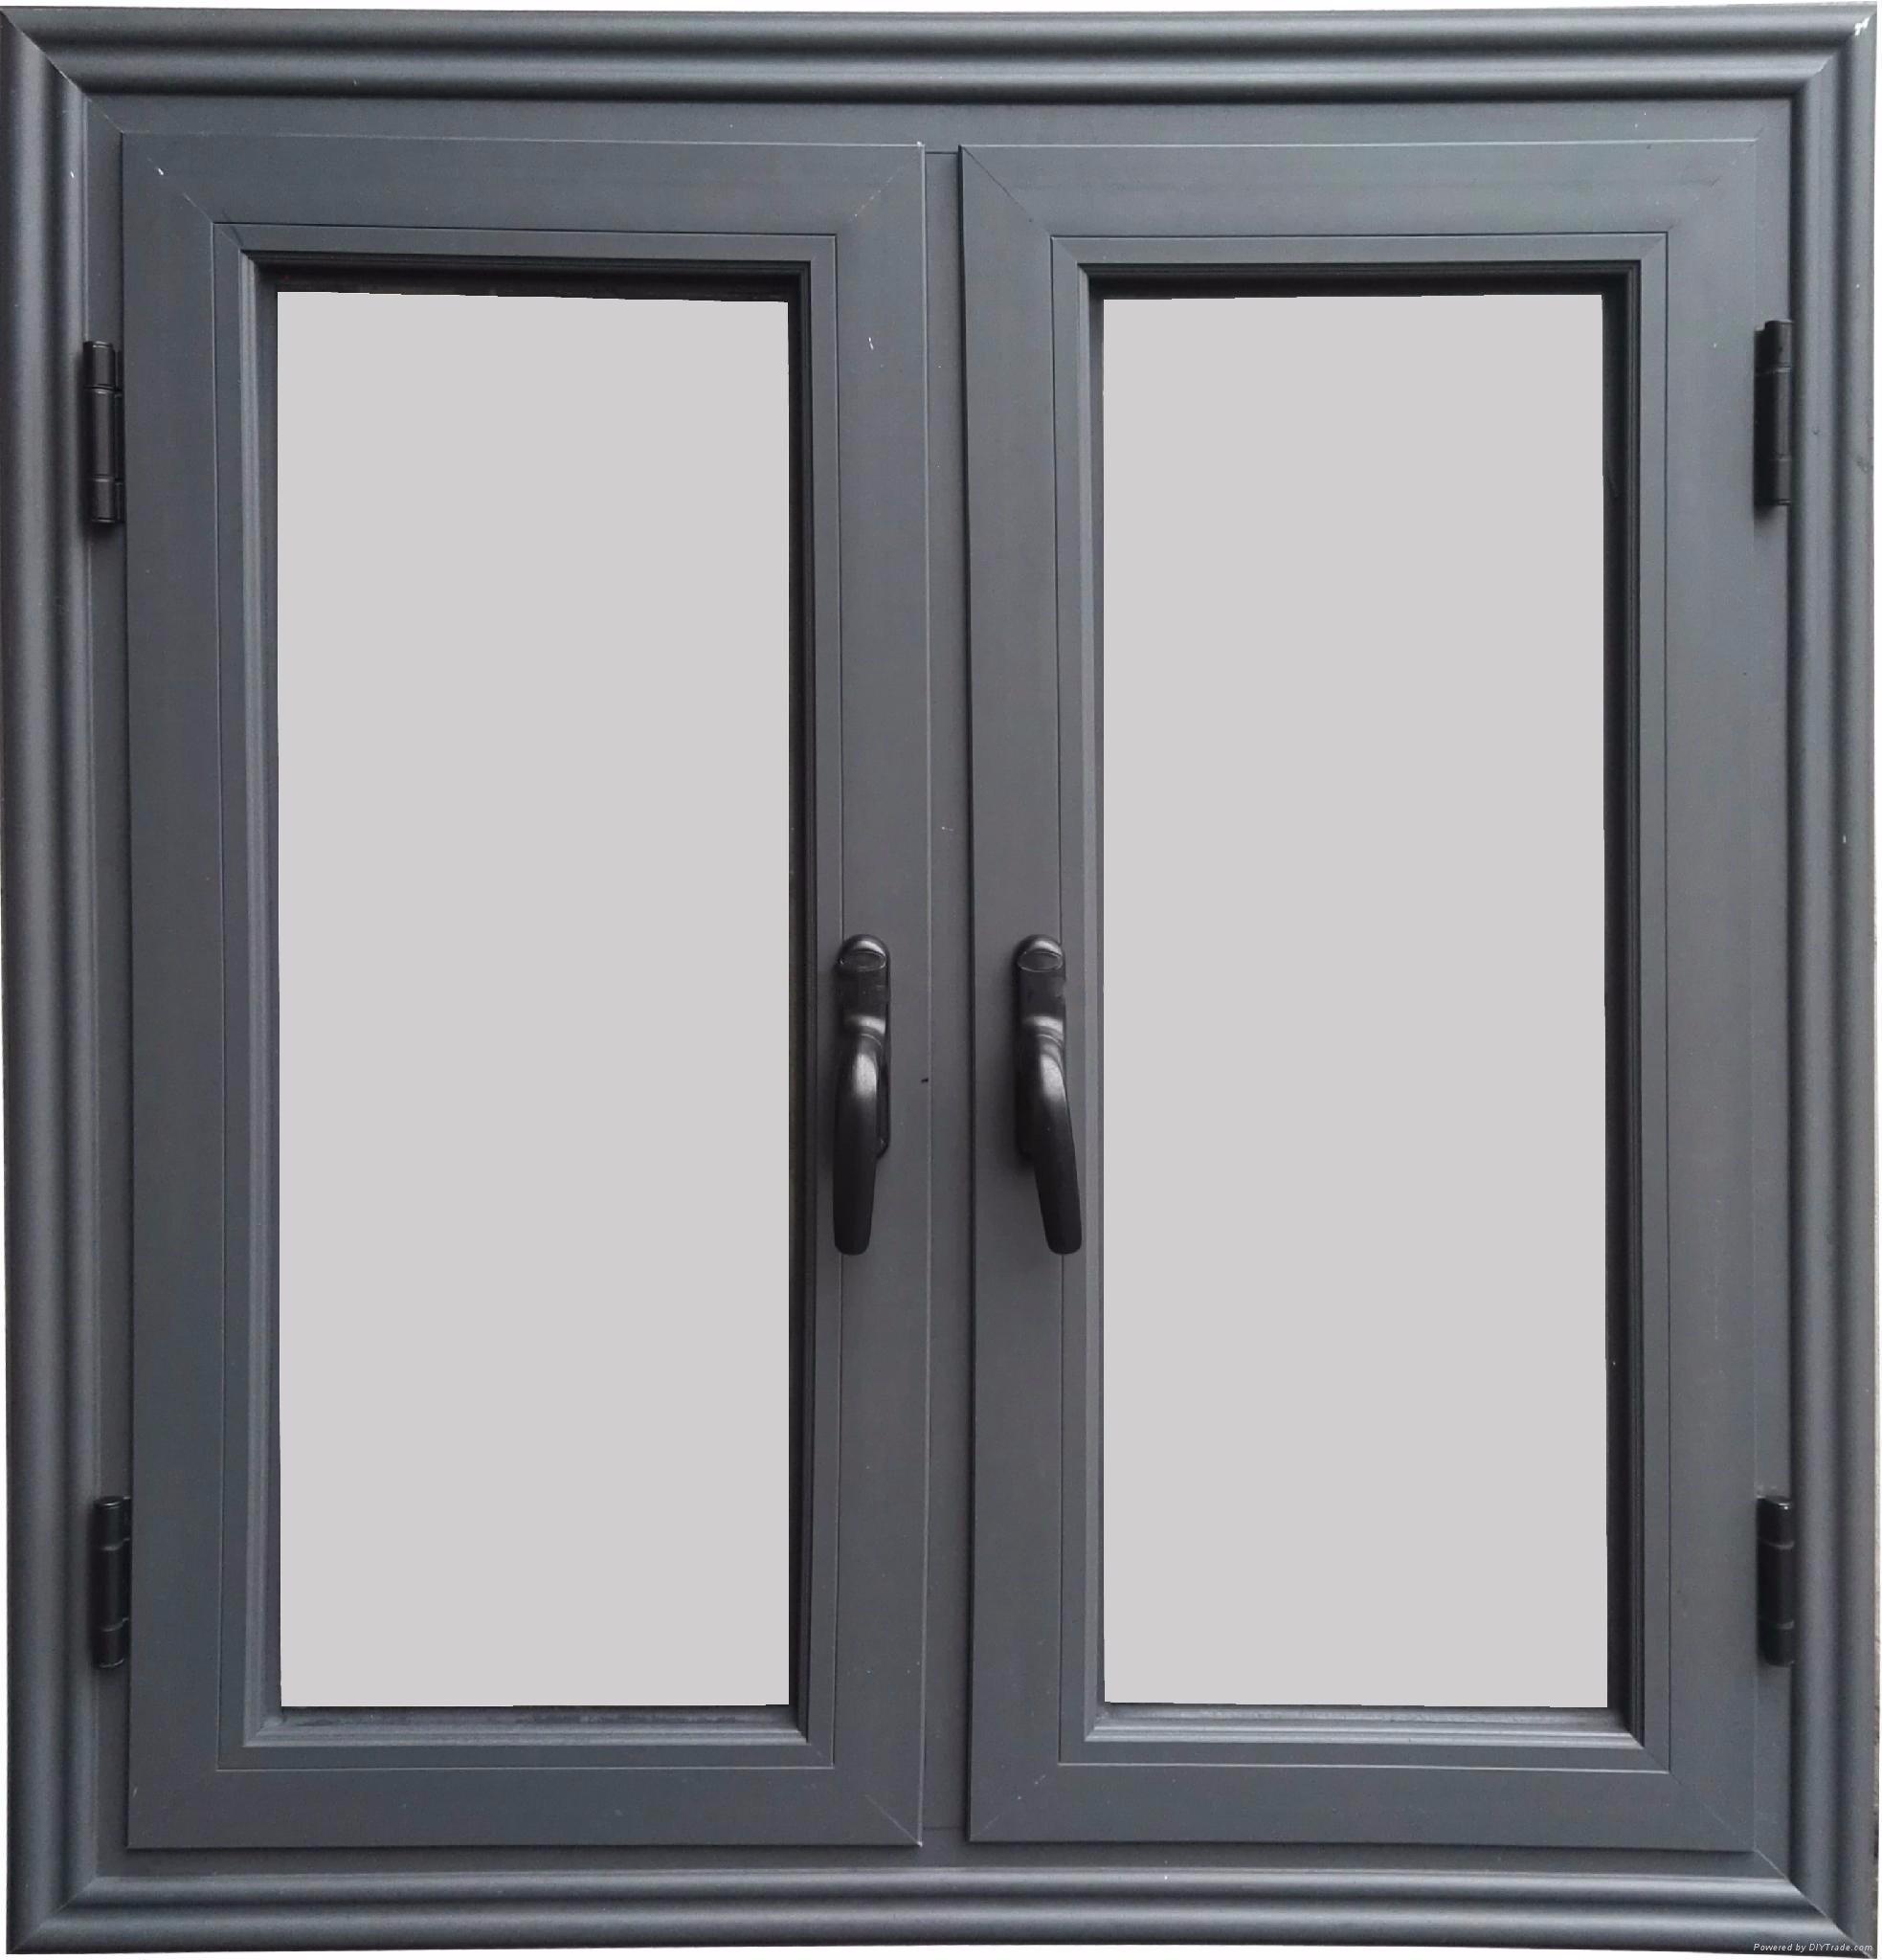 Double Glazed Windows / Windows and Doors / Commercial Aluminium Window Casement